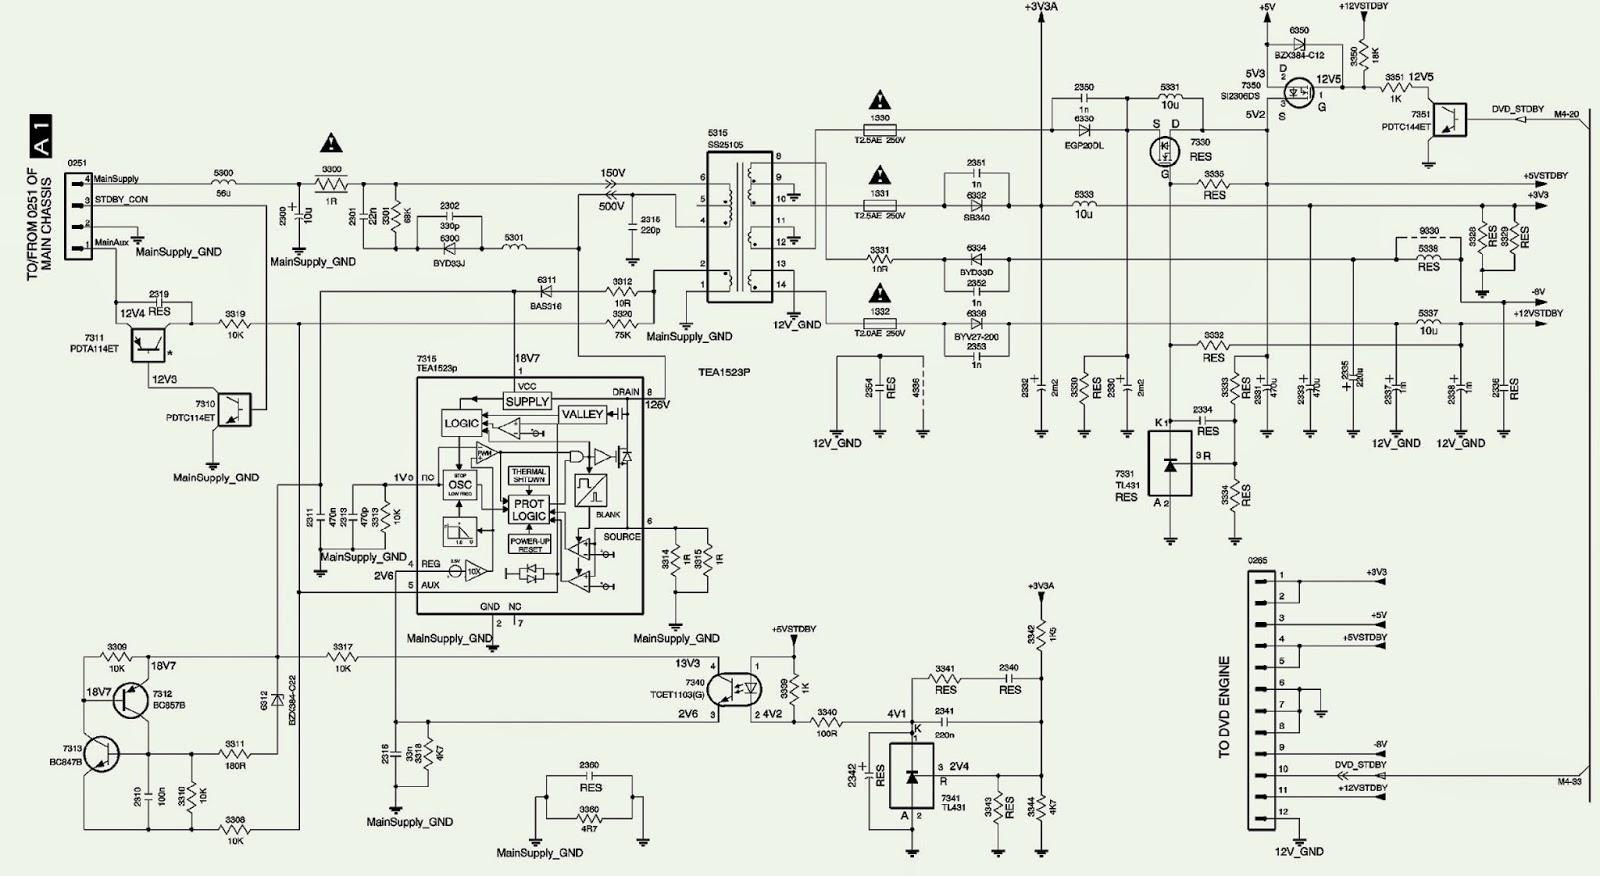 PHILIPS MAGNAVOX – 32ST220P – 27PT543 – TV – POWER SUPPLY